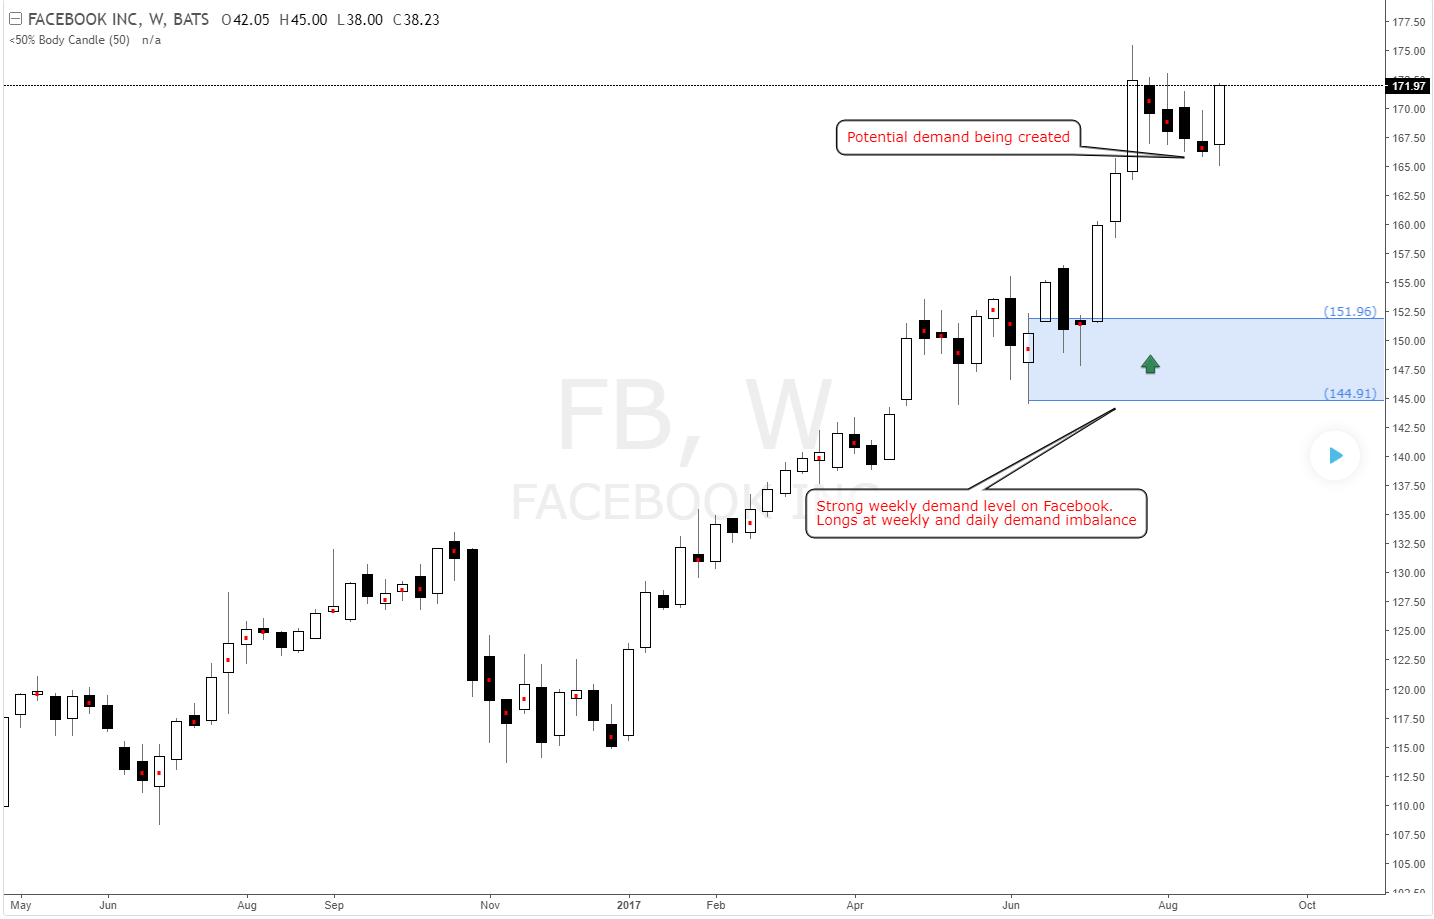 Facebook strong weekly demand imbalance